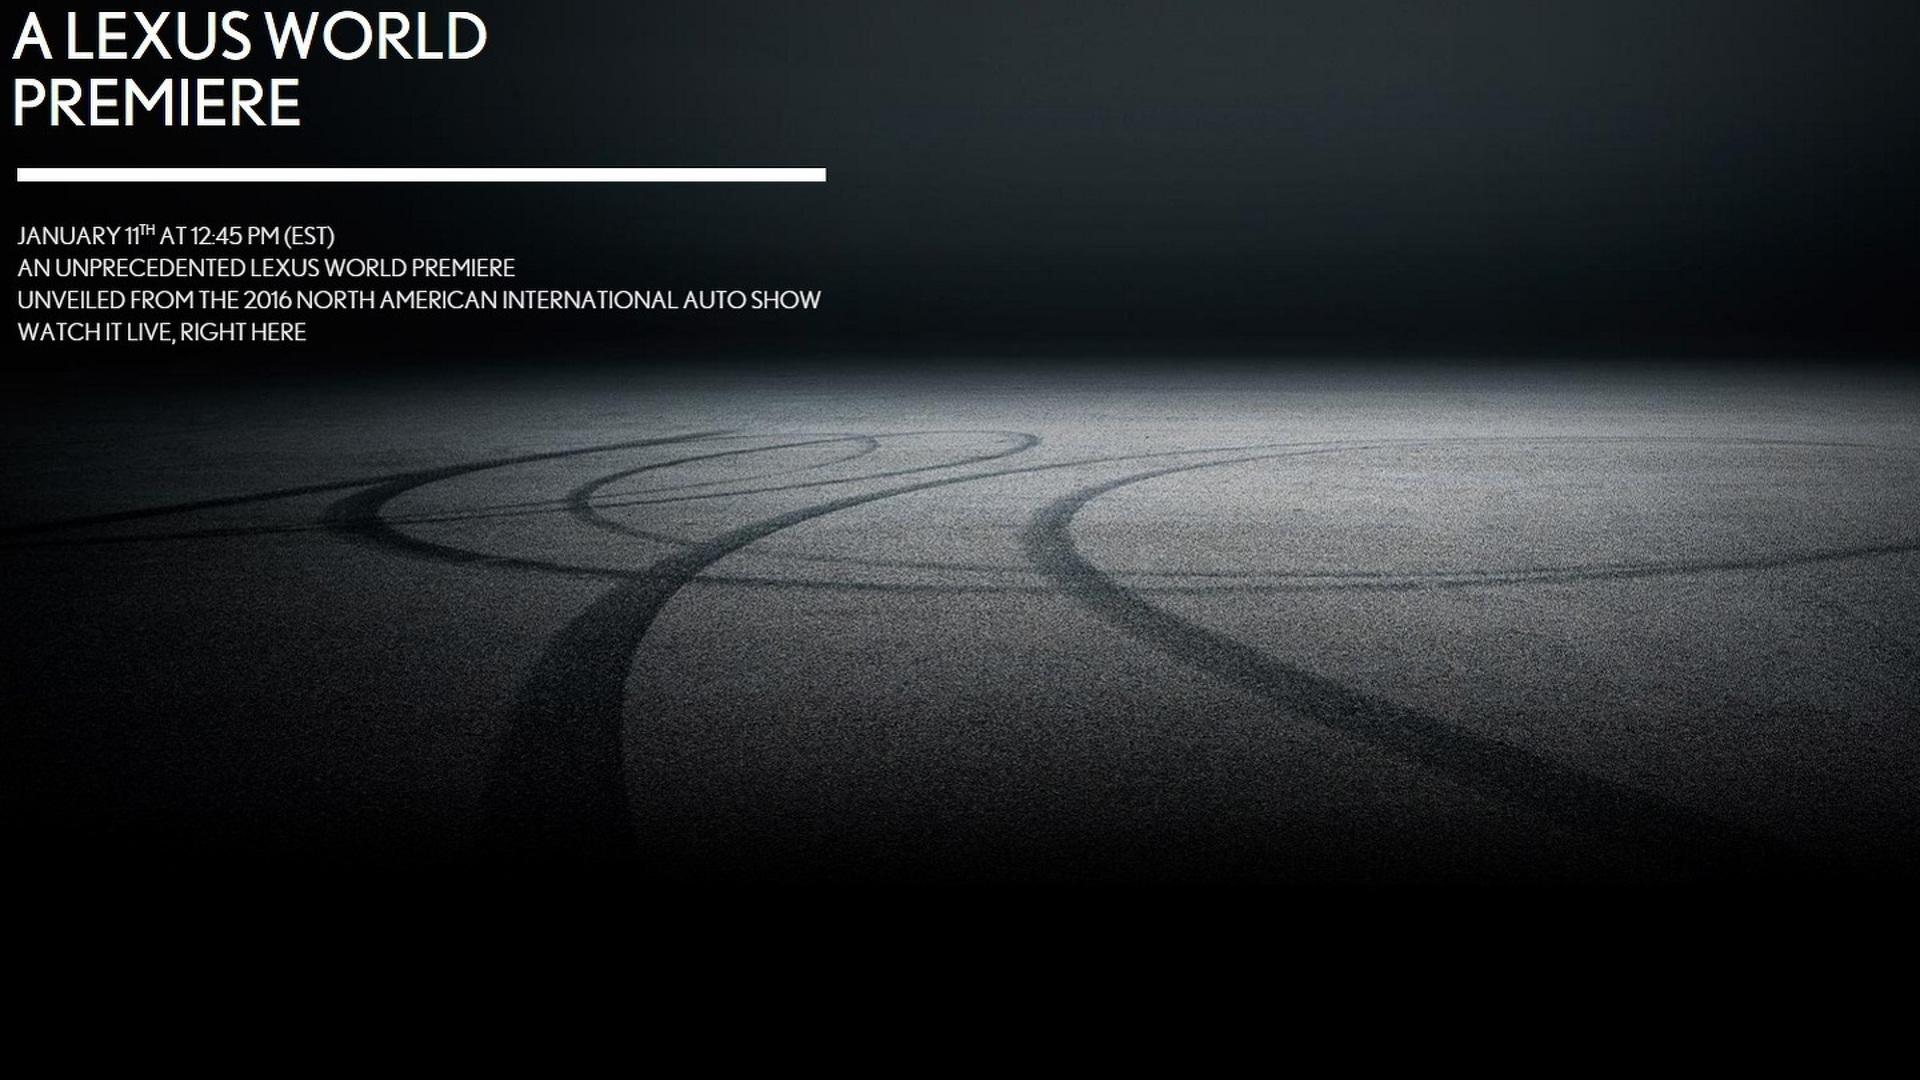 Lexus drops teaser for